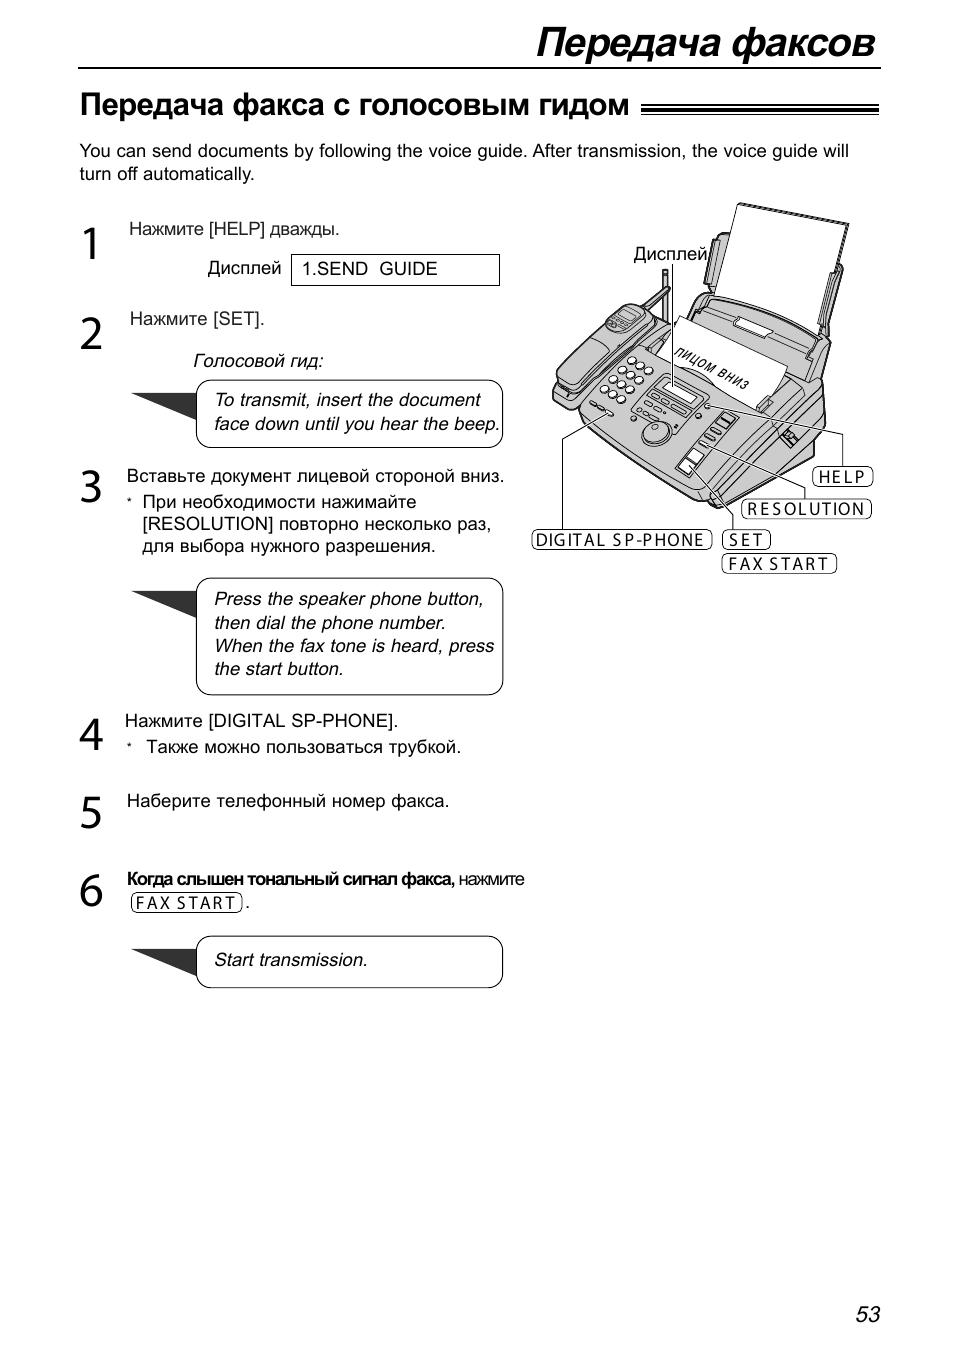 Инструкция по эксплуатации факса panasonic panasonic